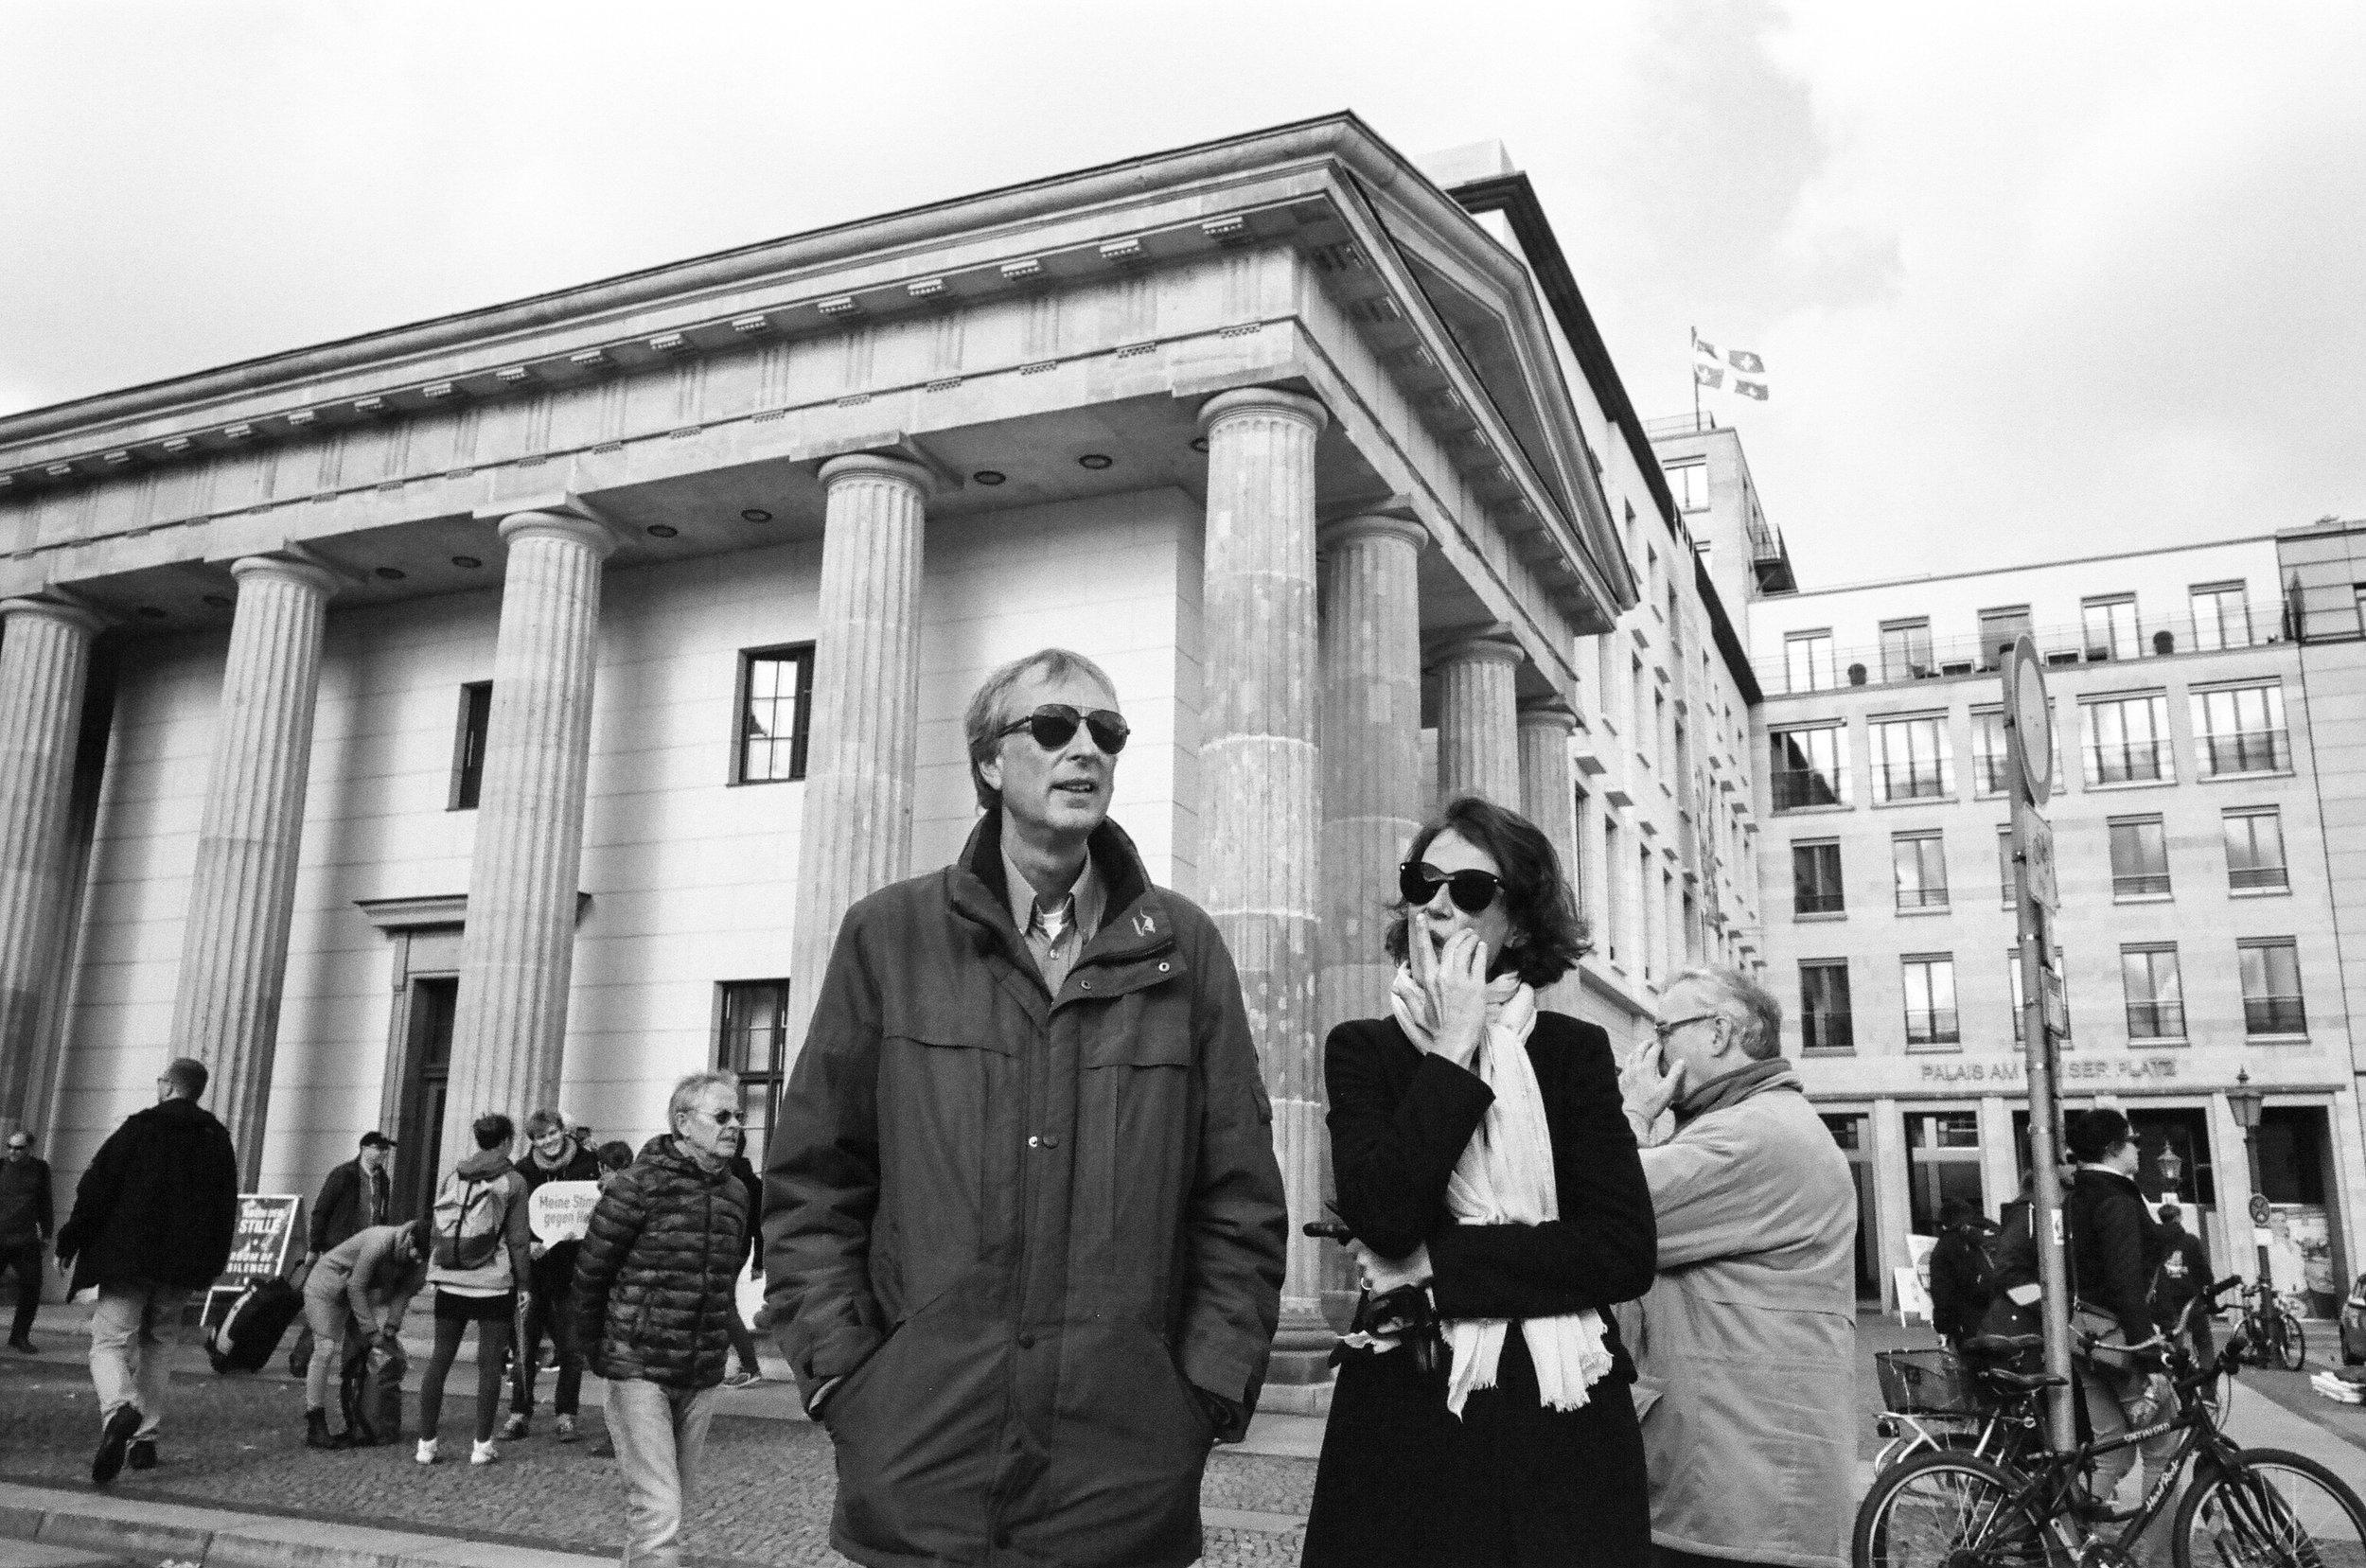 Berlin Locals - Clifford Darby 2017